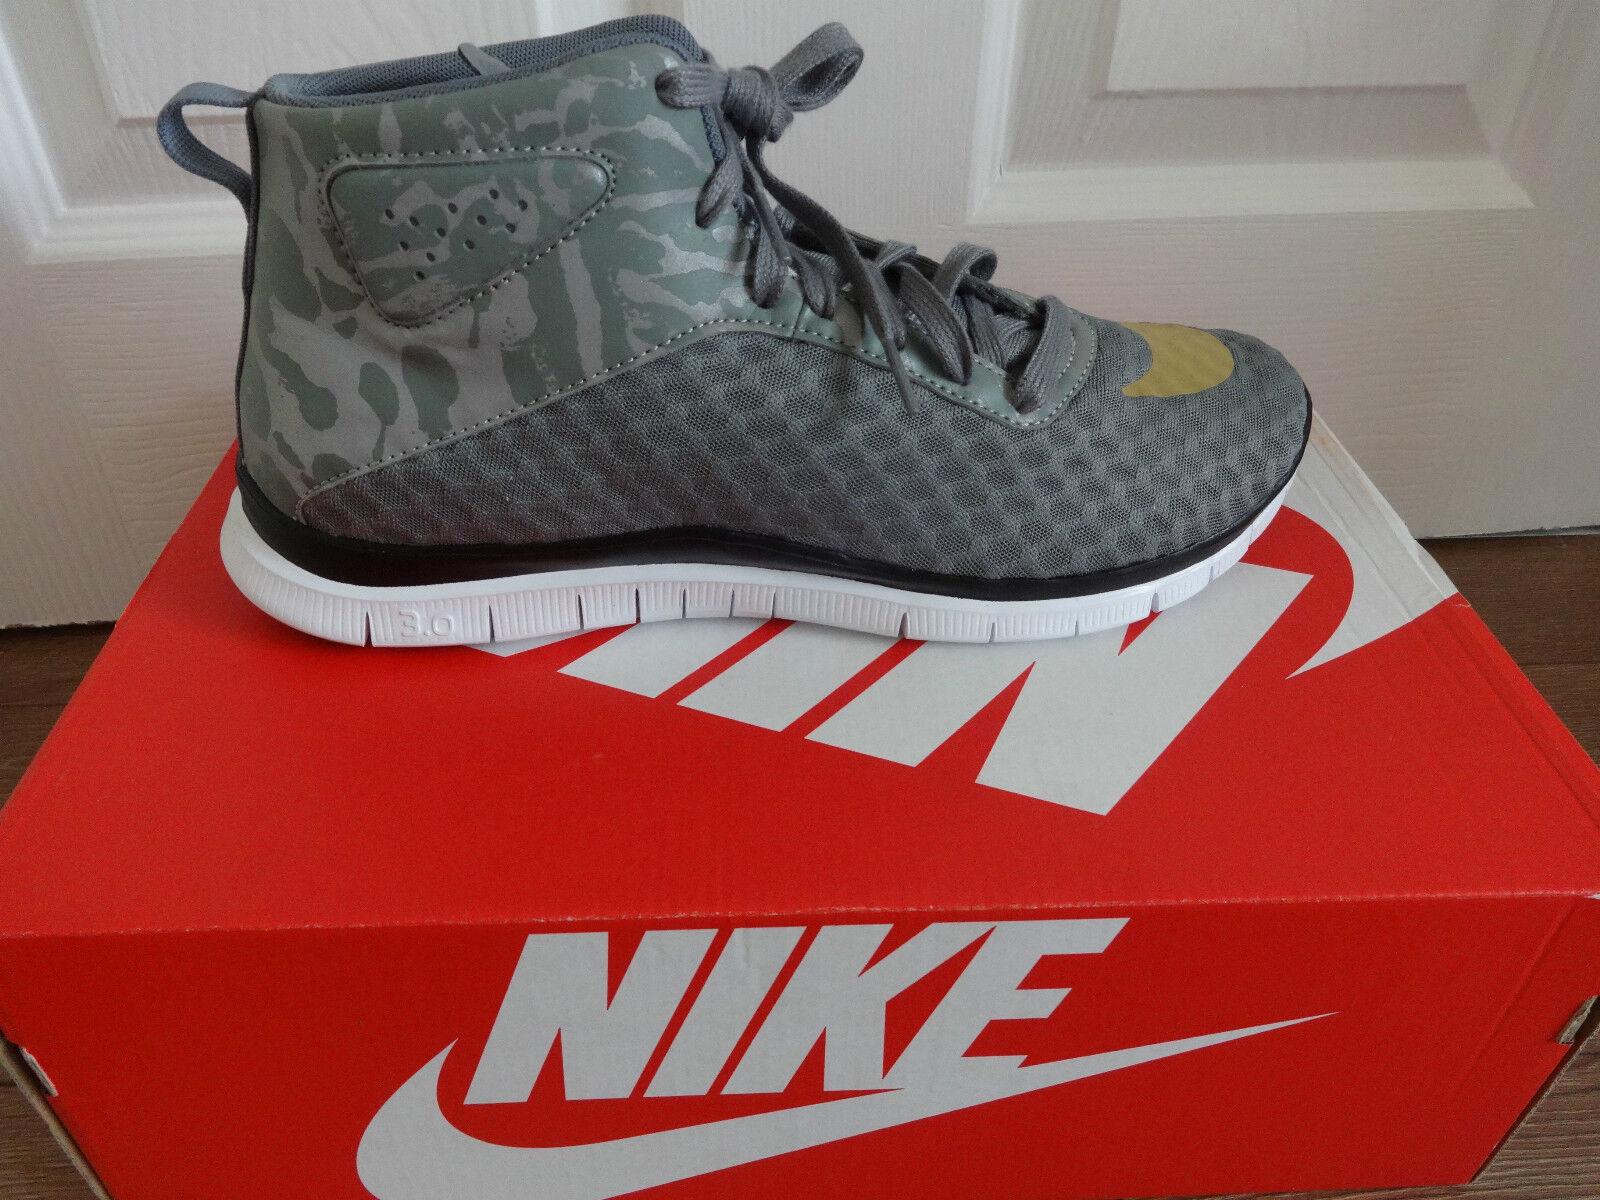 Nike Hypervenom Mid FC 725128 001 Free Free Free Tenis Zapatillas nos 8 Nuevo a52d5a